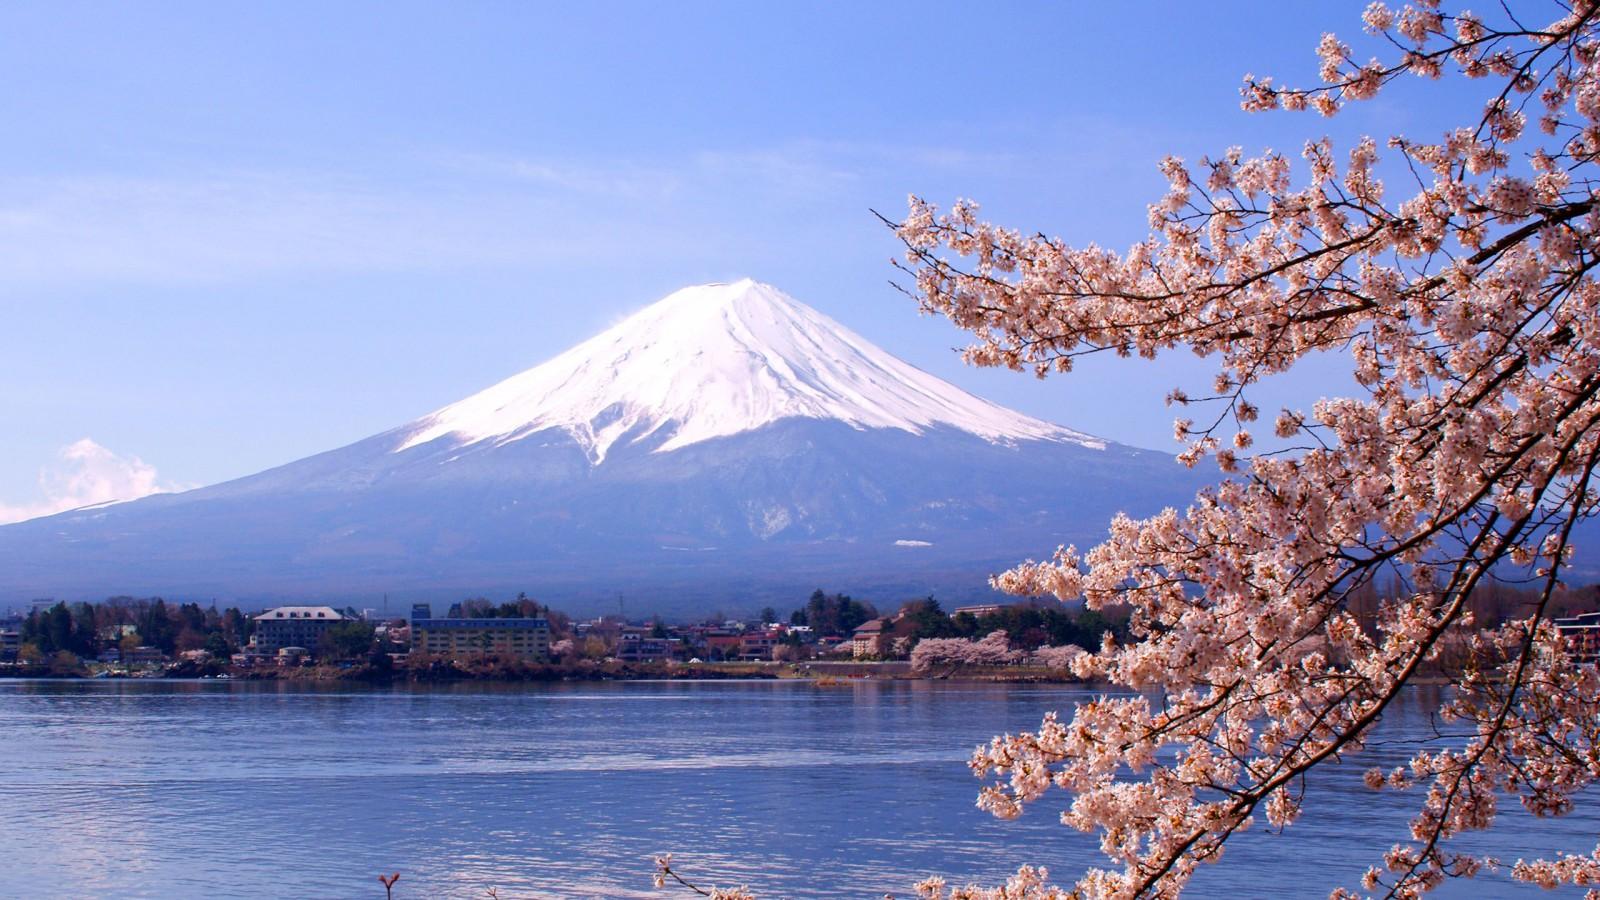 Japanese Landscape 1600x900